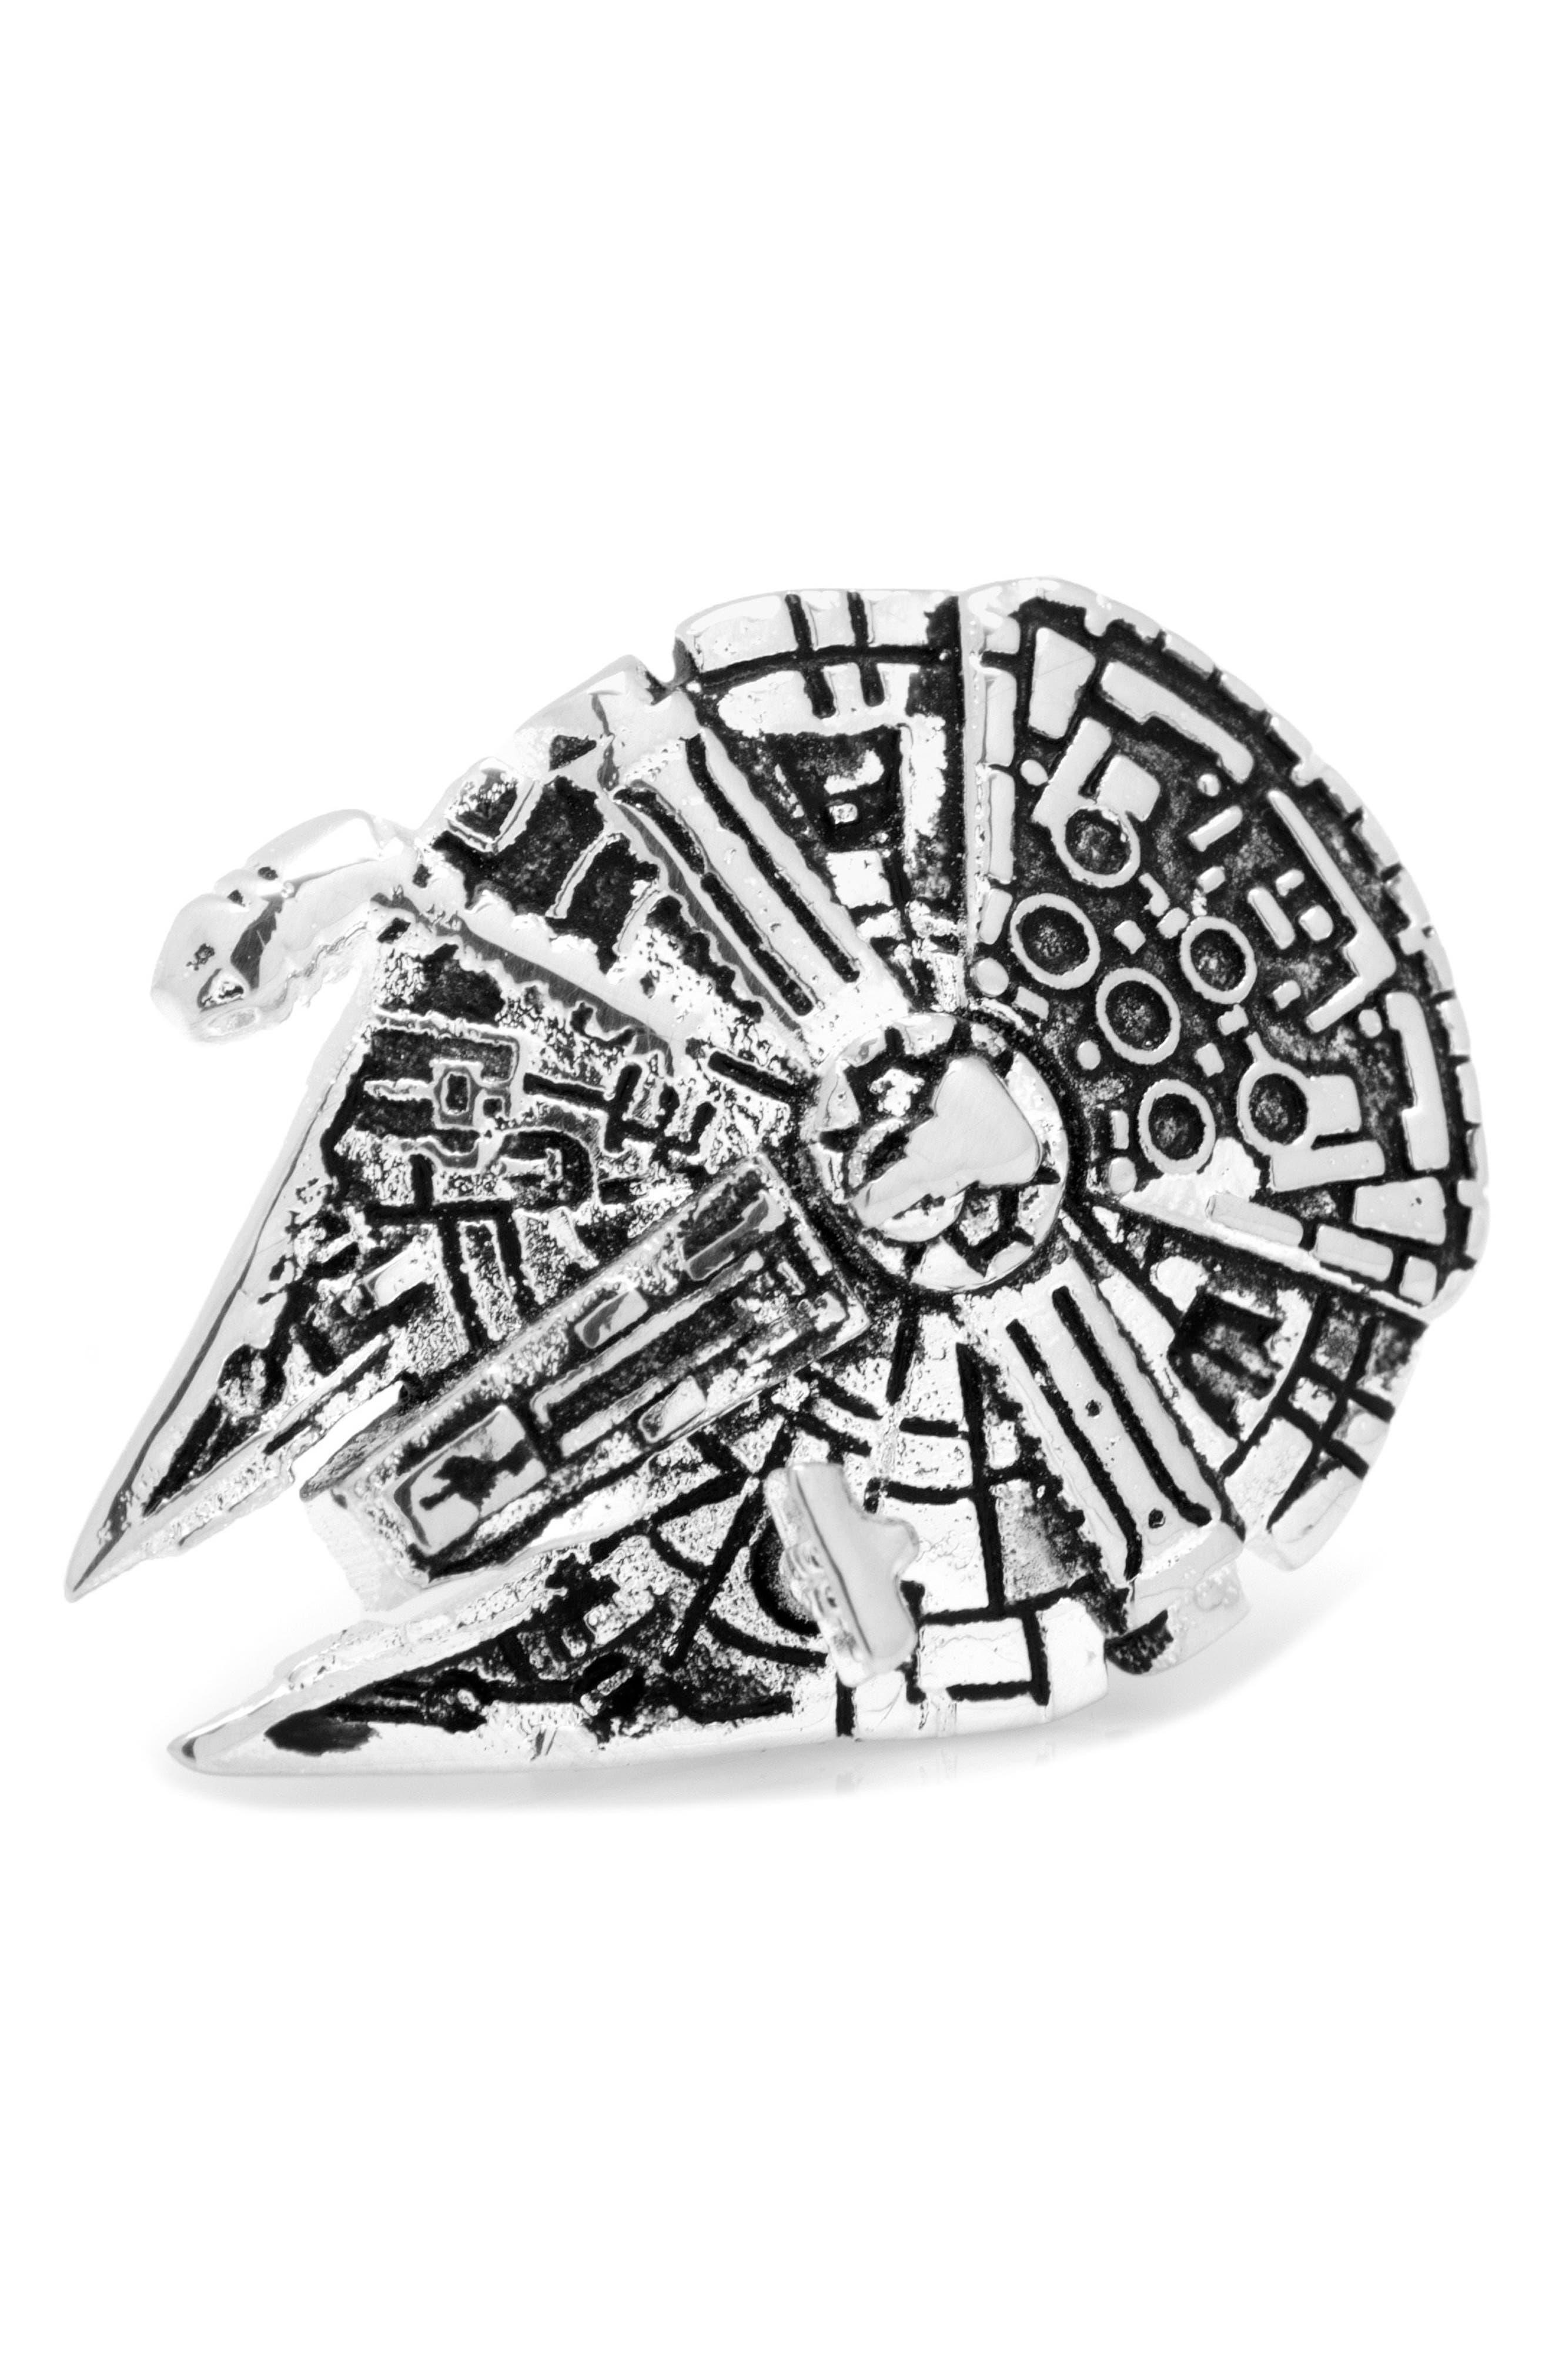 "Cufflinks Inc. ""Star Wars"" 3D Millennium Falcon Lapel Pin,                         Main,                         color, SILVER"